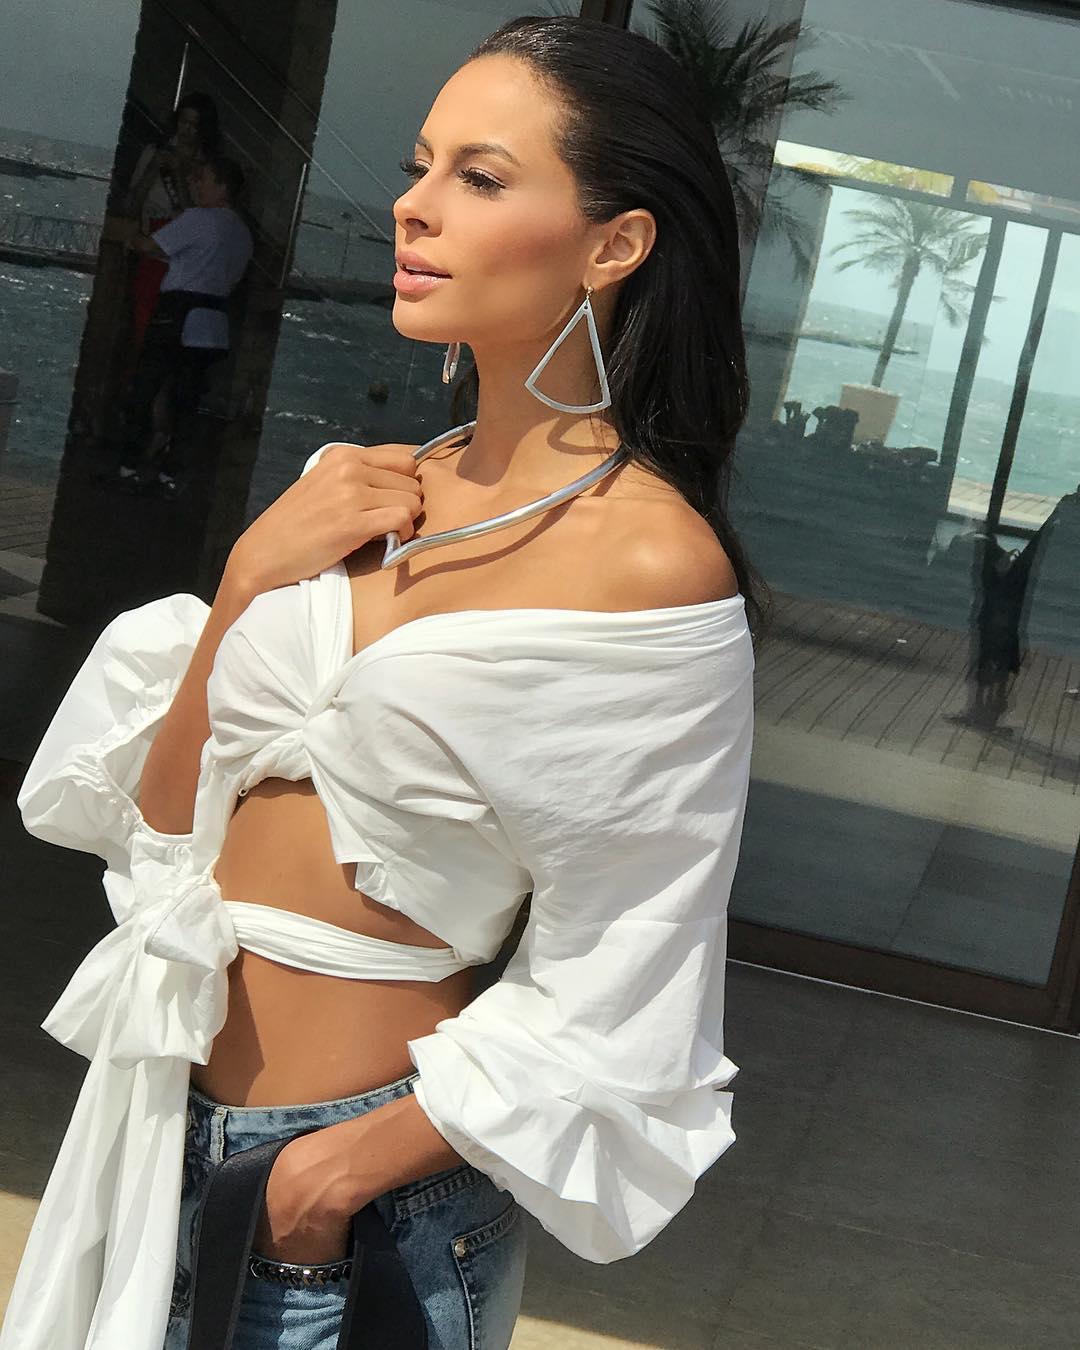 stephany pim, miss eco brasil 2017/top 3 de miss brasil universo 2017. - Página 10 20688215